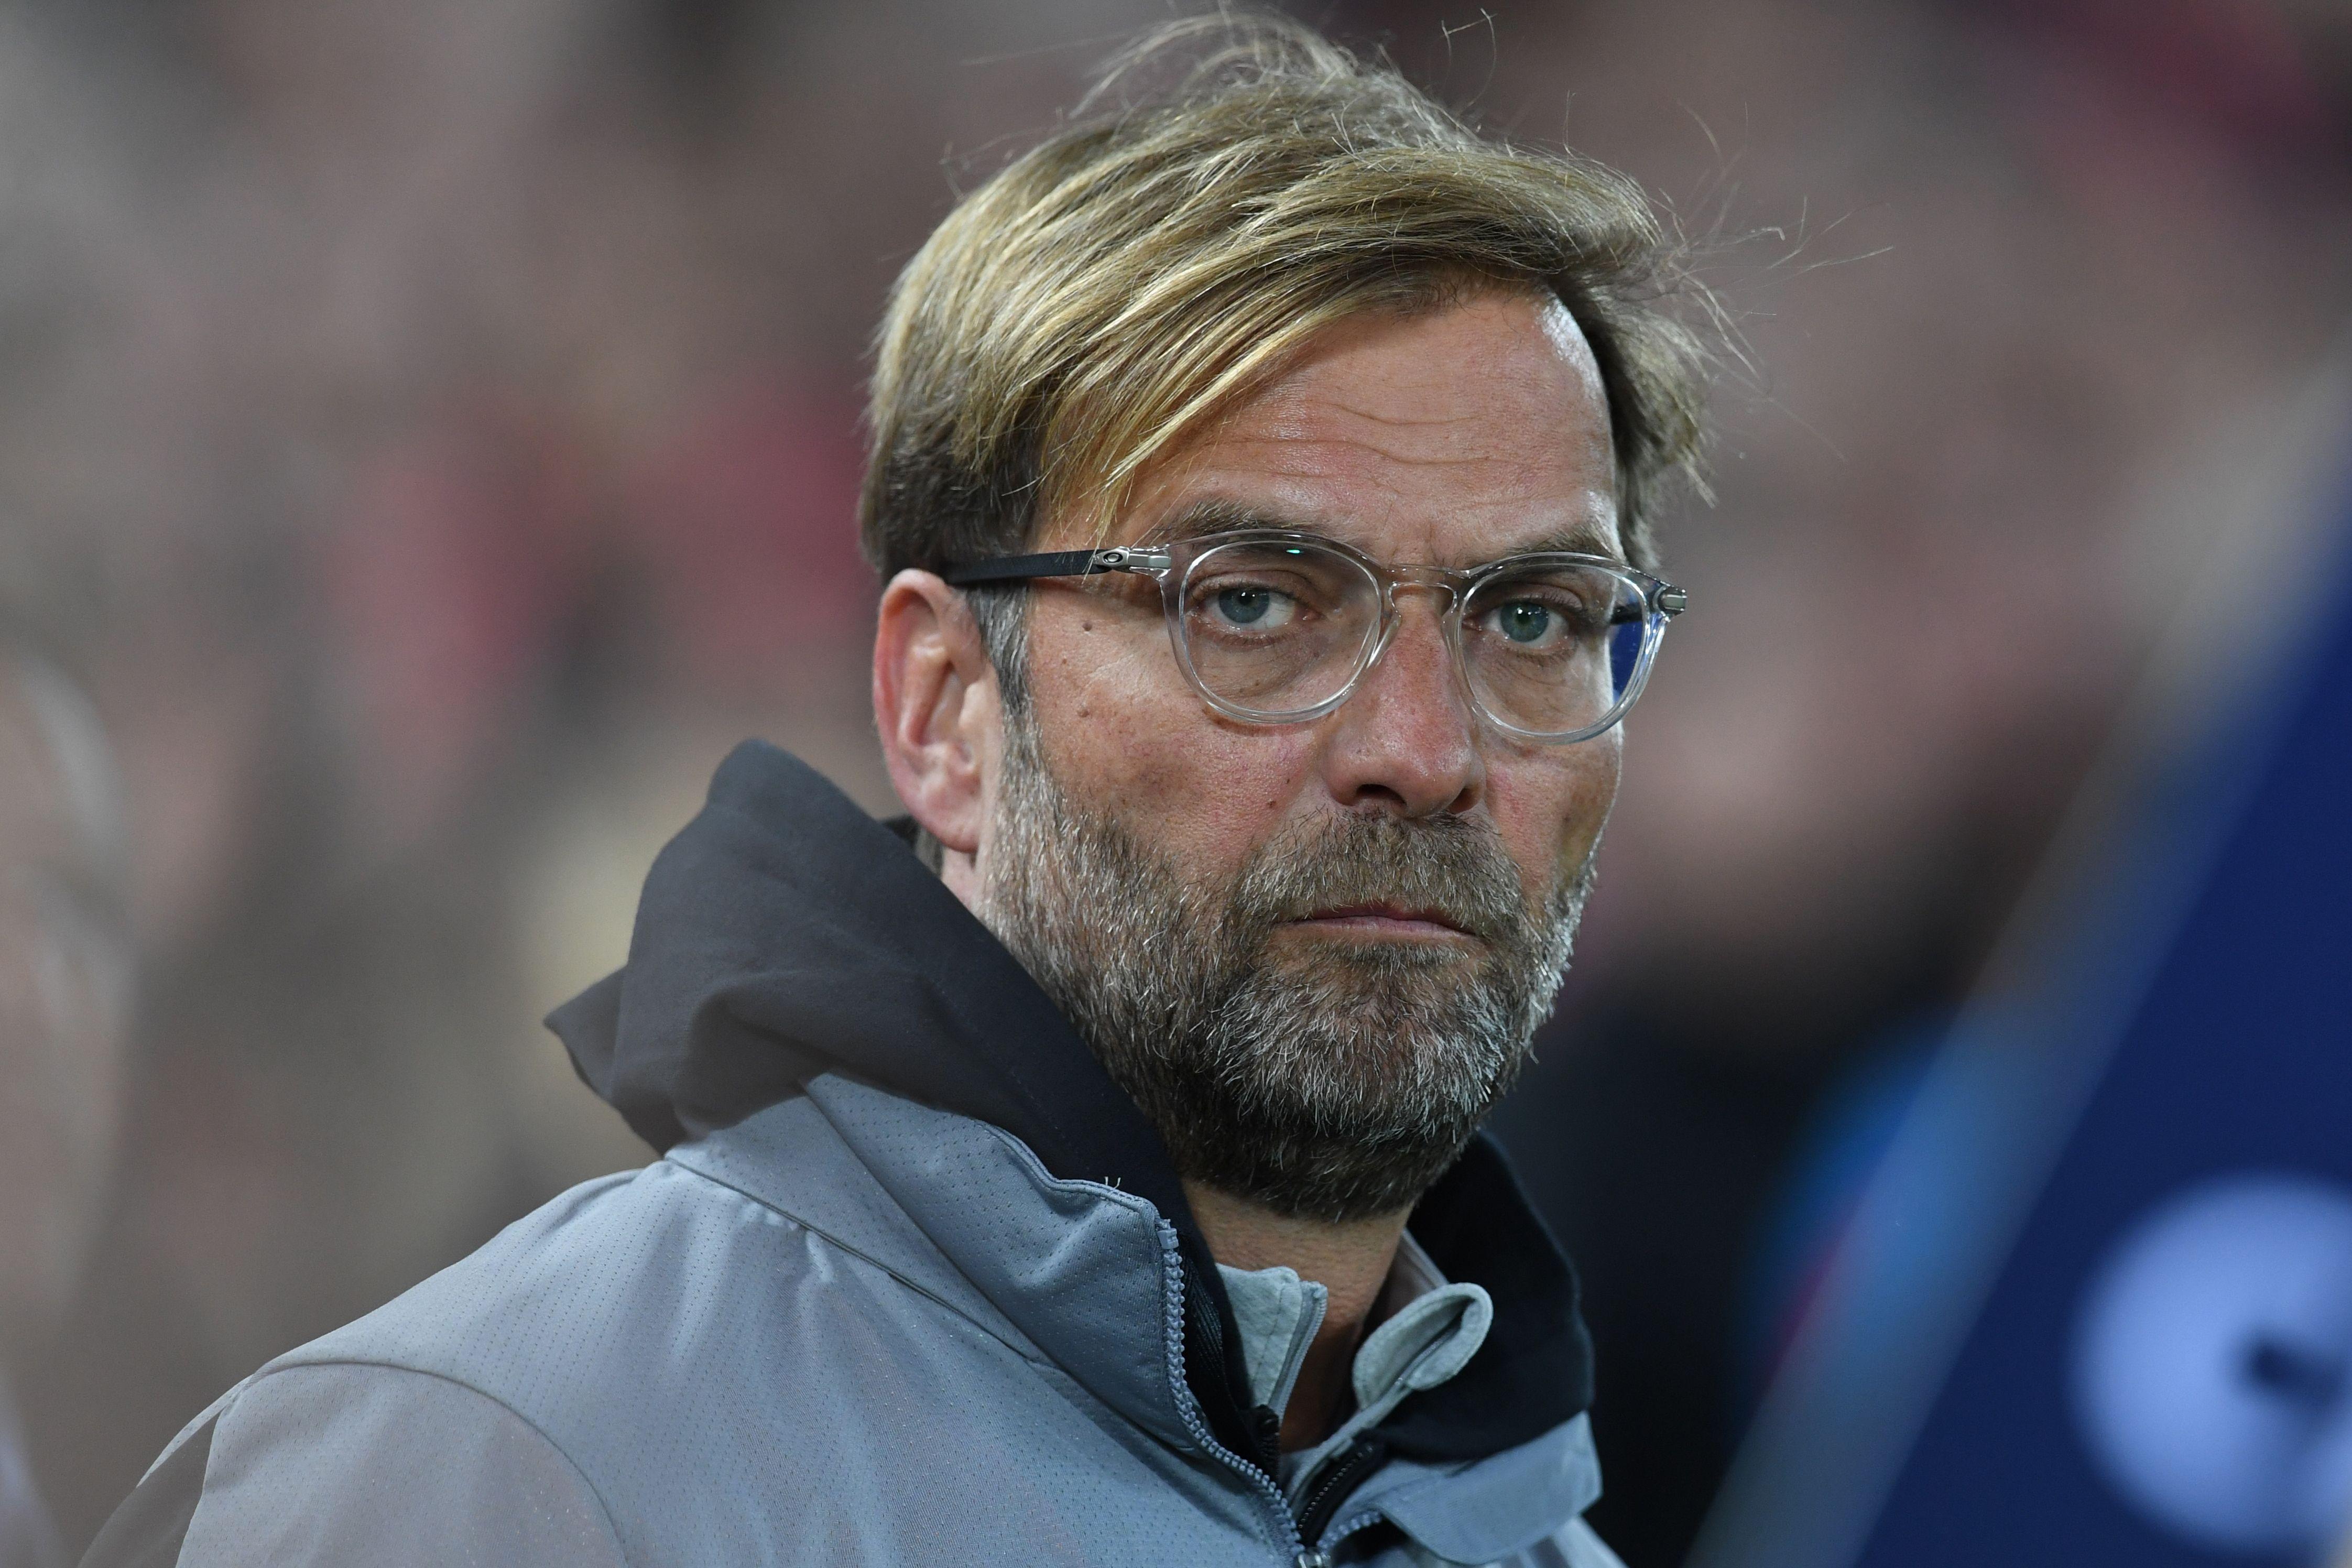 Liverpool need Virgil van Dijk transfer to fix sloppy defence, says Man Utd legend Rio Ferdinand